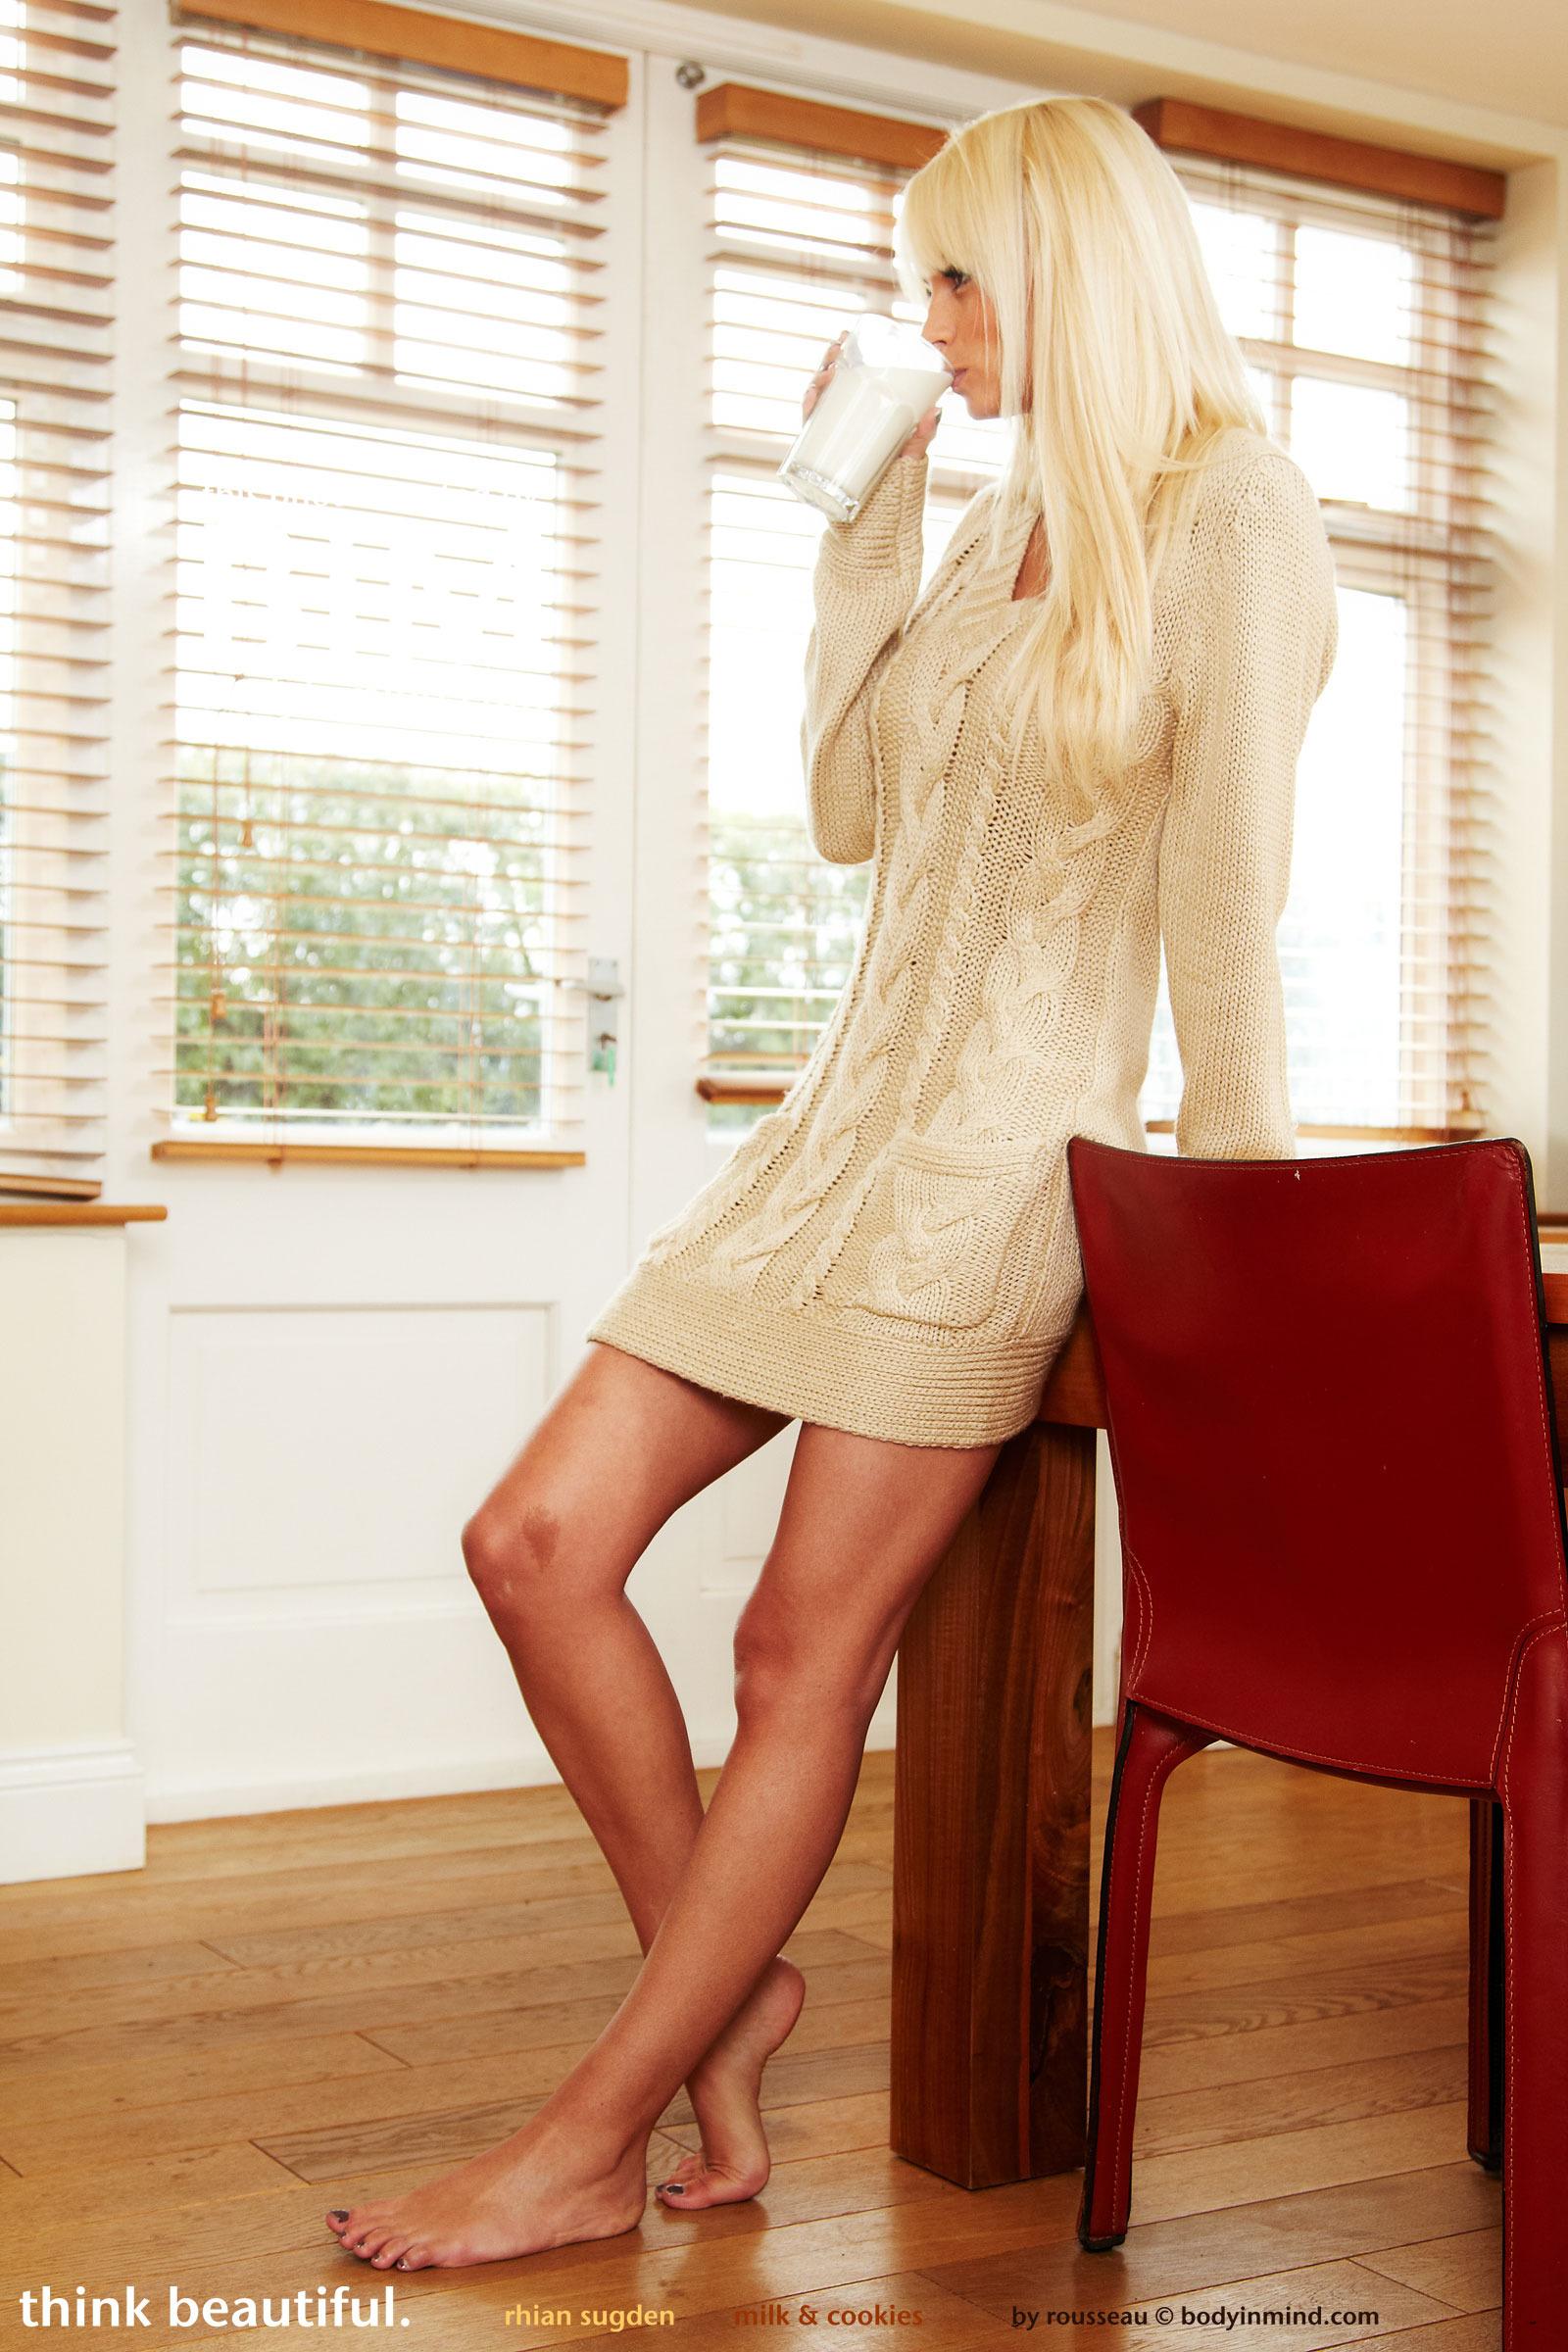 Good Anime Wallpaper Wallpaper Women Model Blonde Long Hair Portrait